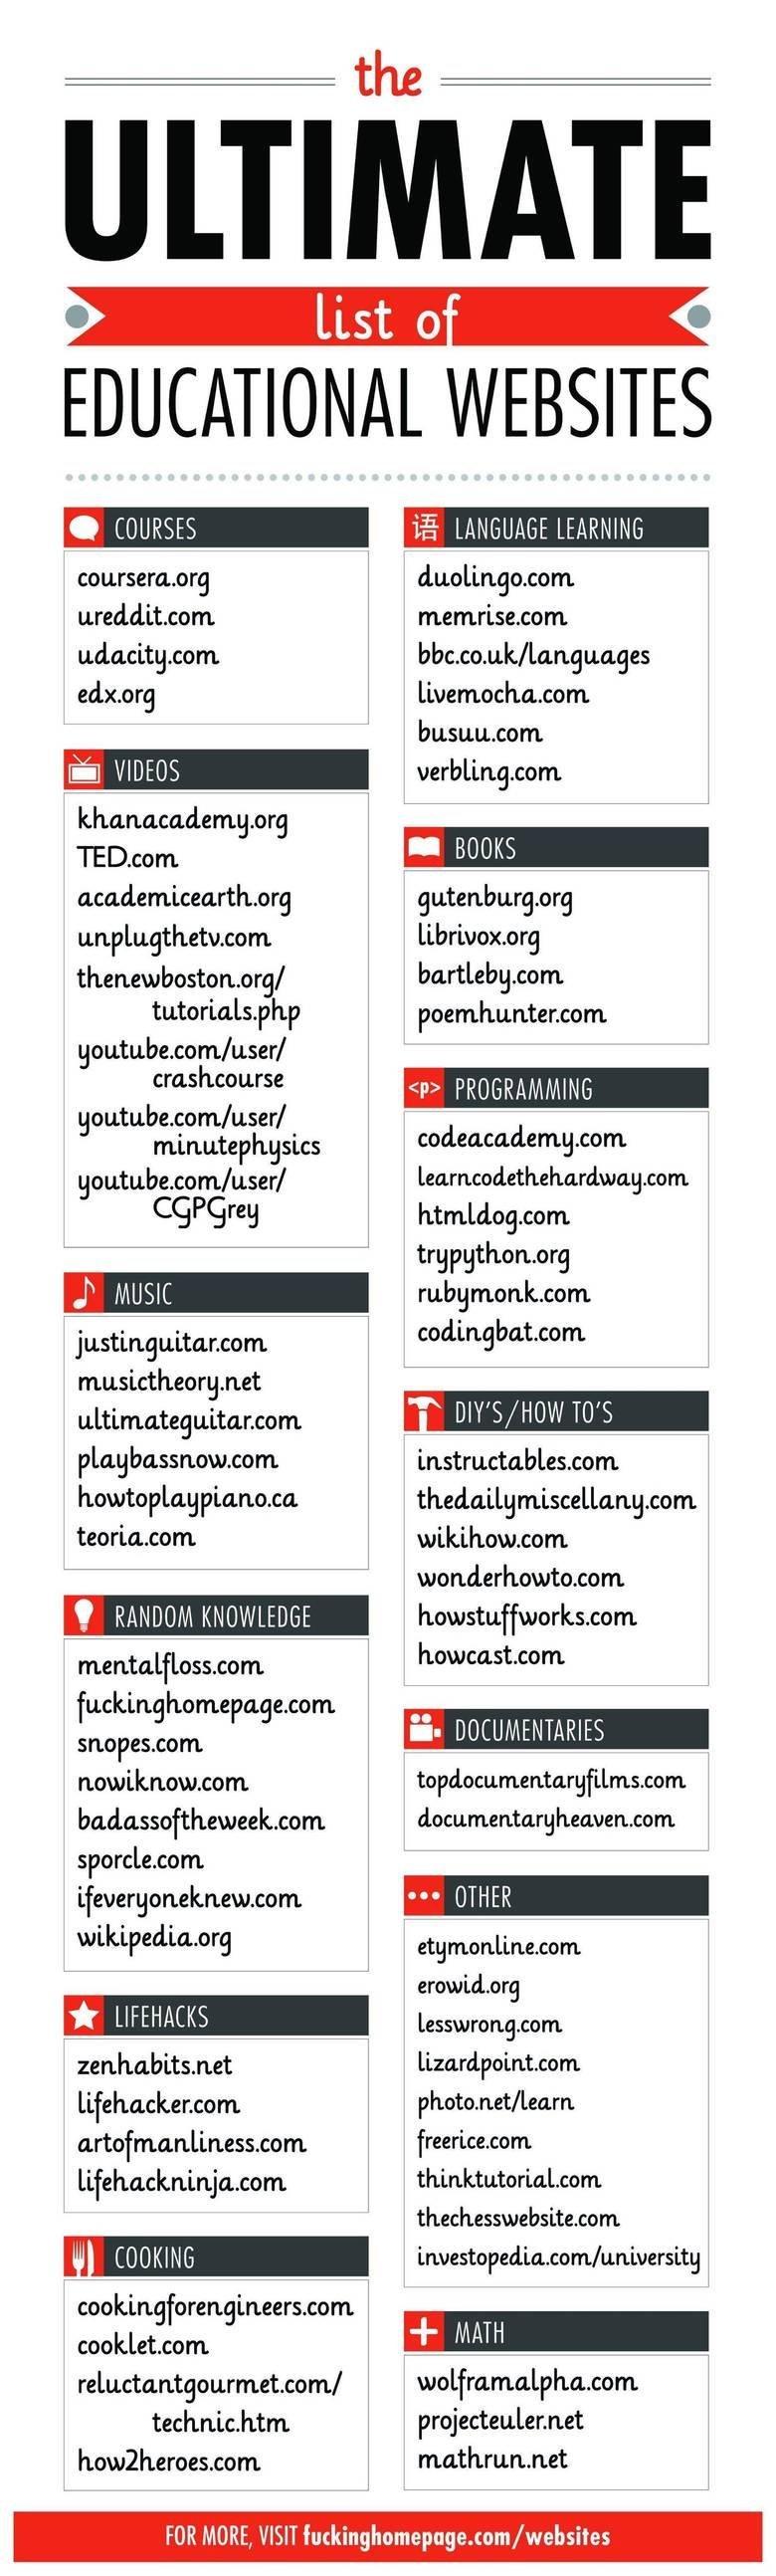 Everyone should know these. . q list CE q EDUCATIONAL WEBSITES u, COURSES cou. rseja.. org creddit. corra edx. org E VIDEOS TED. com. corra tutor' Lals. php row Everyone should know these q list CE EDUCATIONAL WEBSITES u COURSES cou rseja org creddit corra edx E VIDEOS TED com tutor' Lals php row